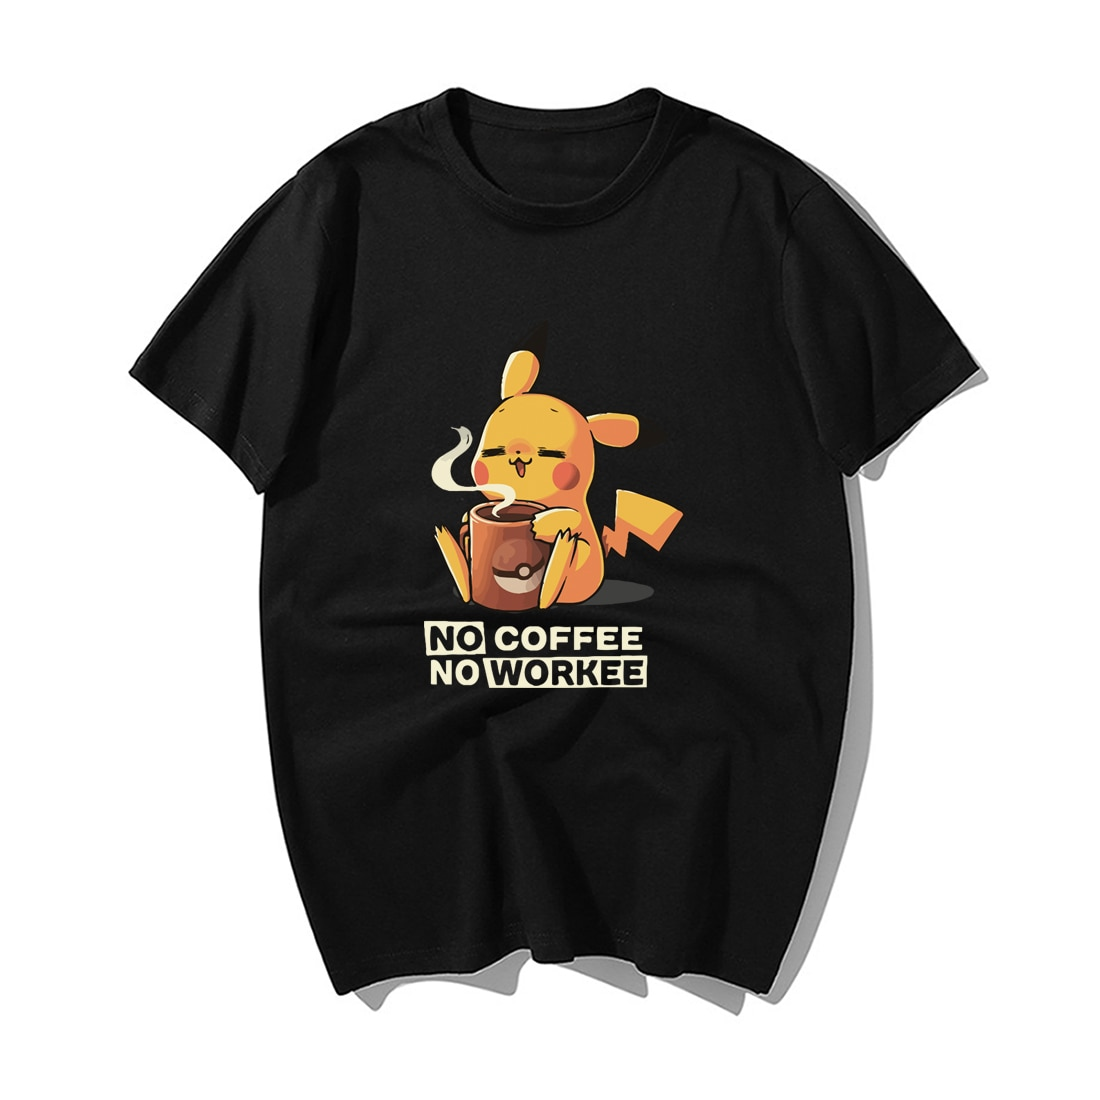 Funny No Coffee No Workee T Shirt Japanese Anime Pikachu Tshirt Men Summer Casual Cotton Shortsleeve Tshirts Harajuku Streetwear